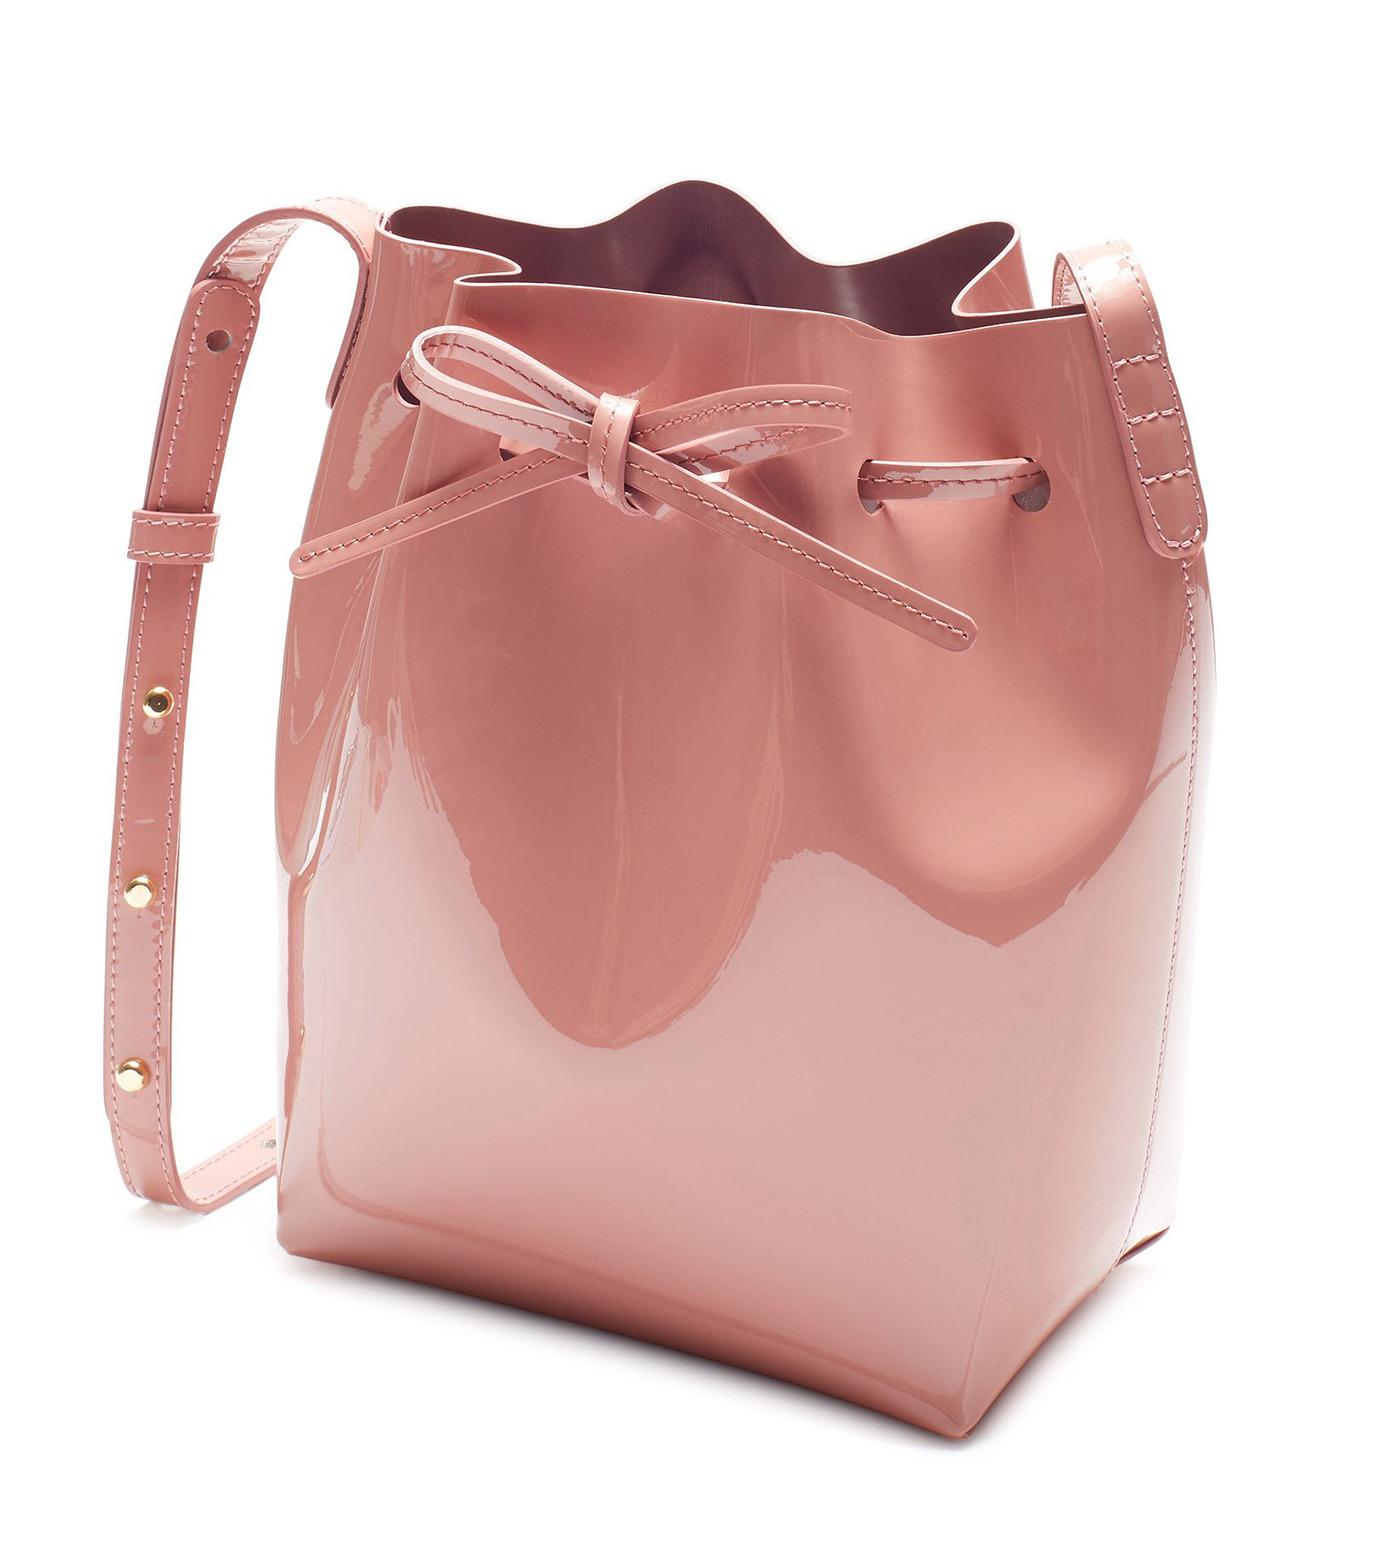 Mansur Gavriel(マンサーガブリエル)のpatent mini bucket bag-LIGHT PINK(ハンドバッグ/hand bag)-HMB004PA-71 拡大詳細画像2